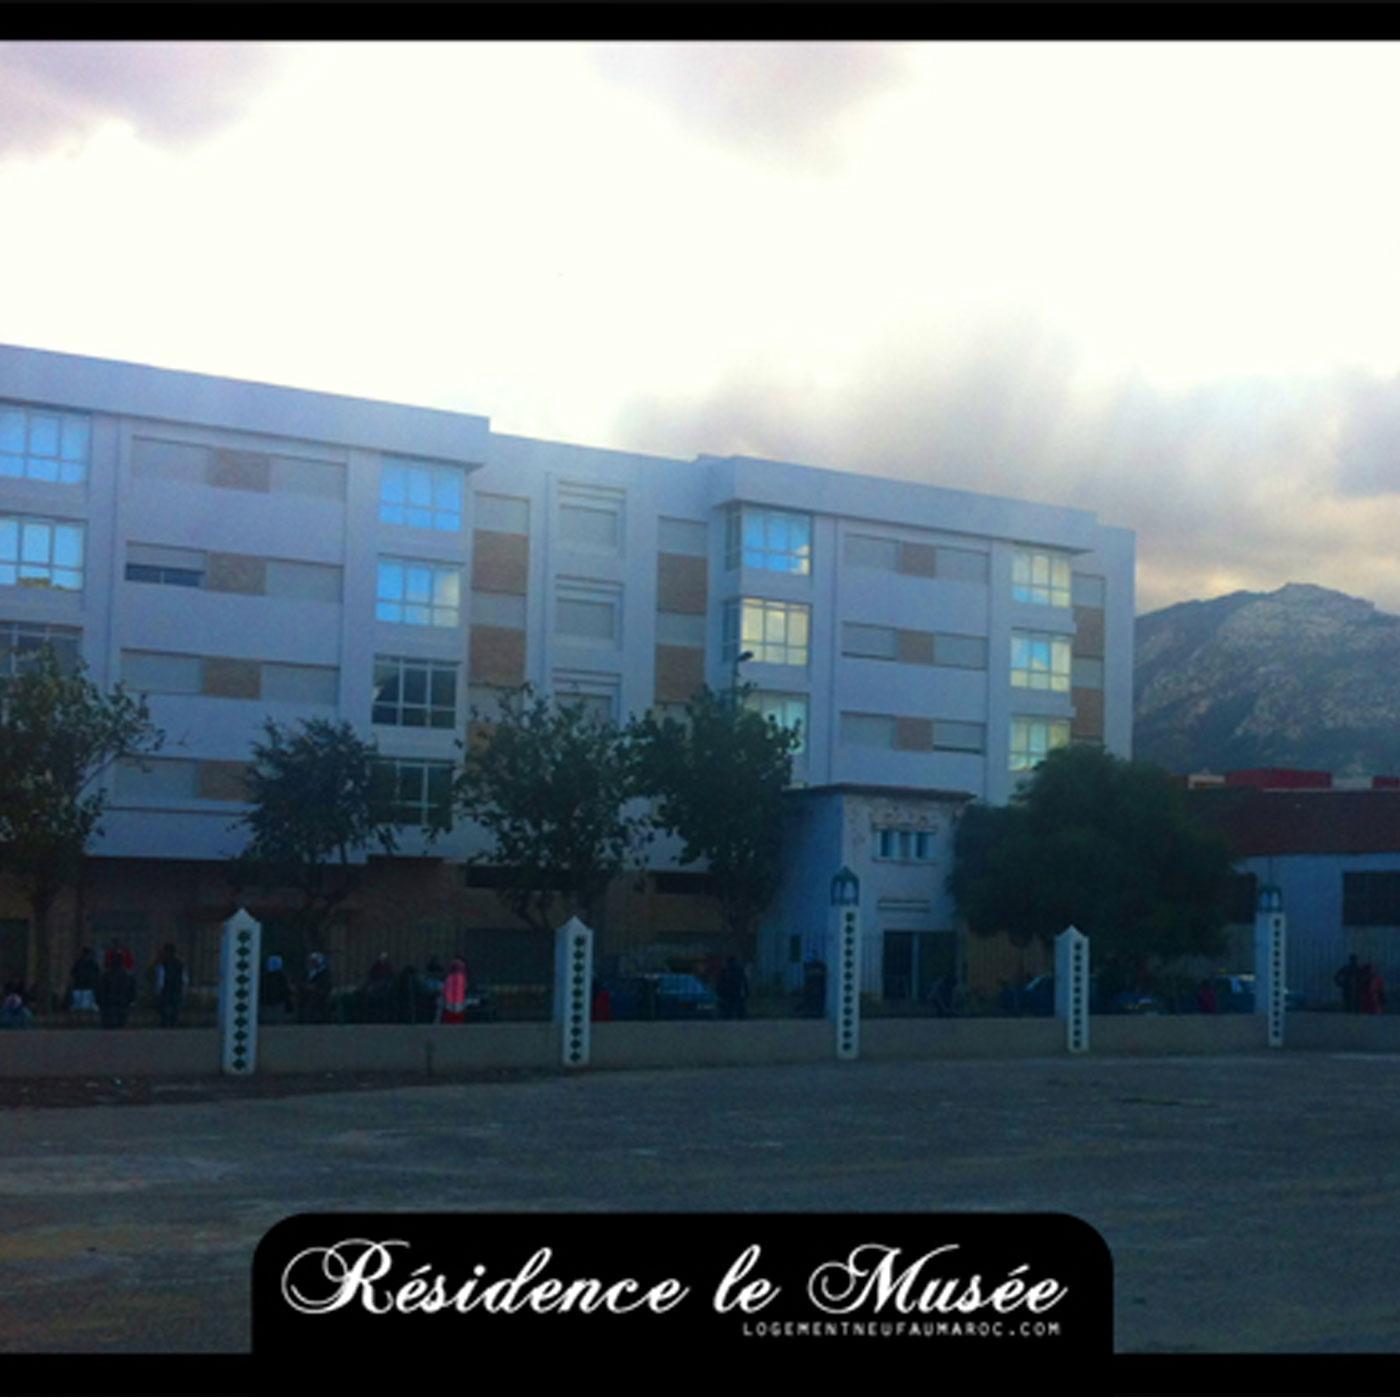 Verkoop 3 slaapkamers t touan tetouan marokko - Slaapkamer marokko ...